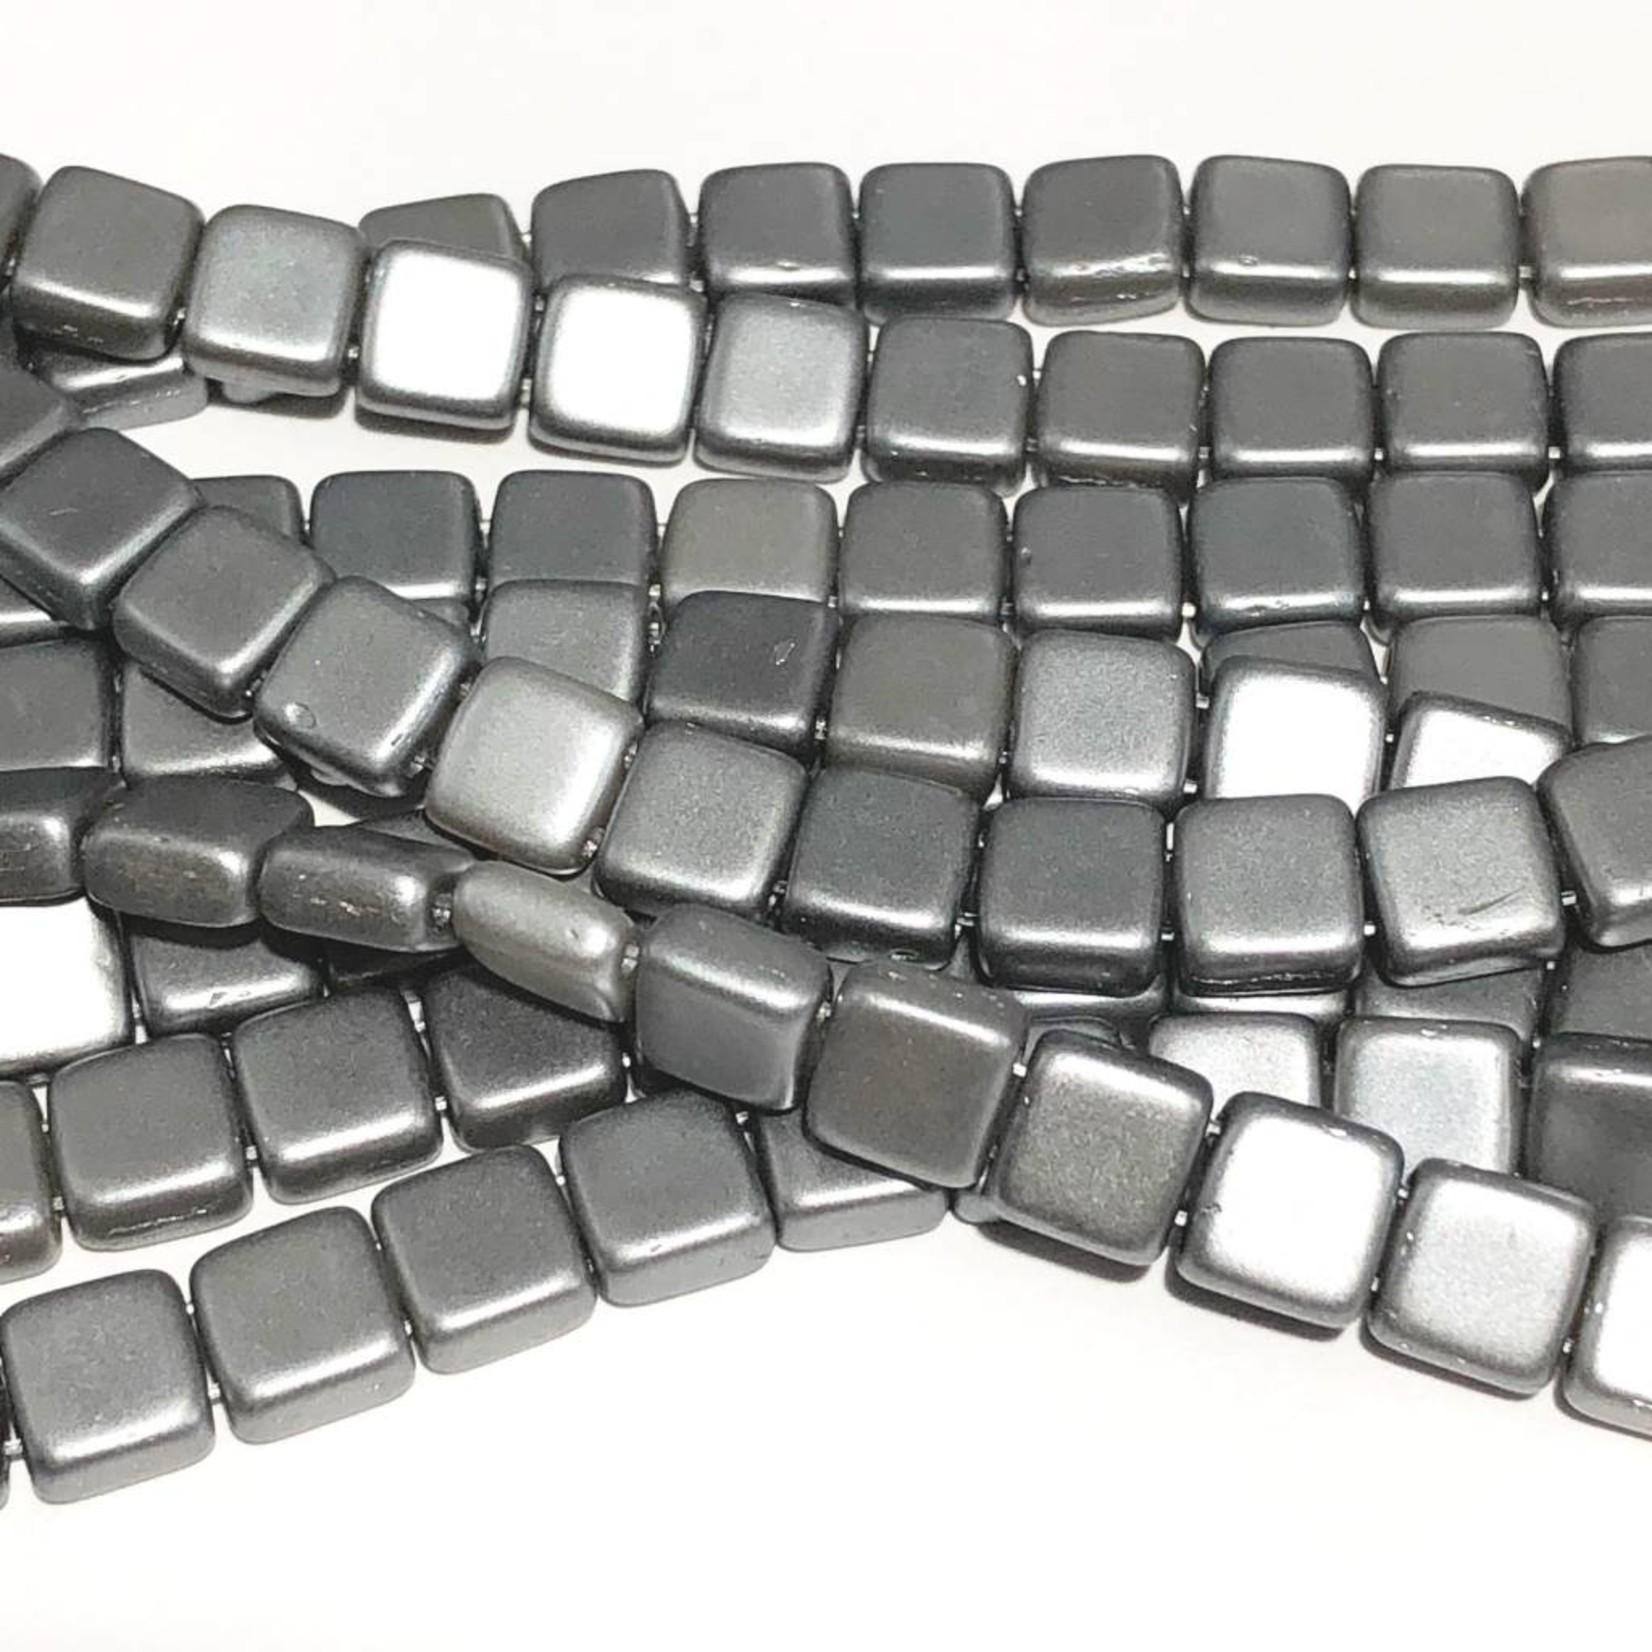 CzechMates TILE Pearl Coat Silver